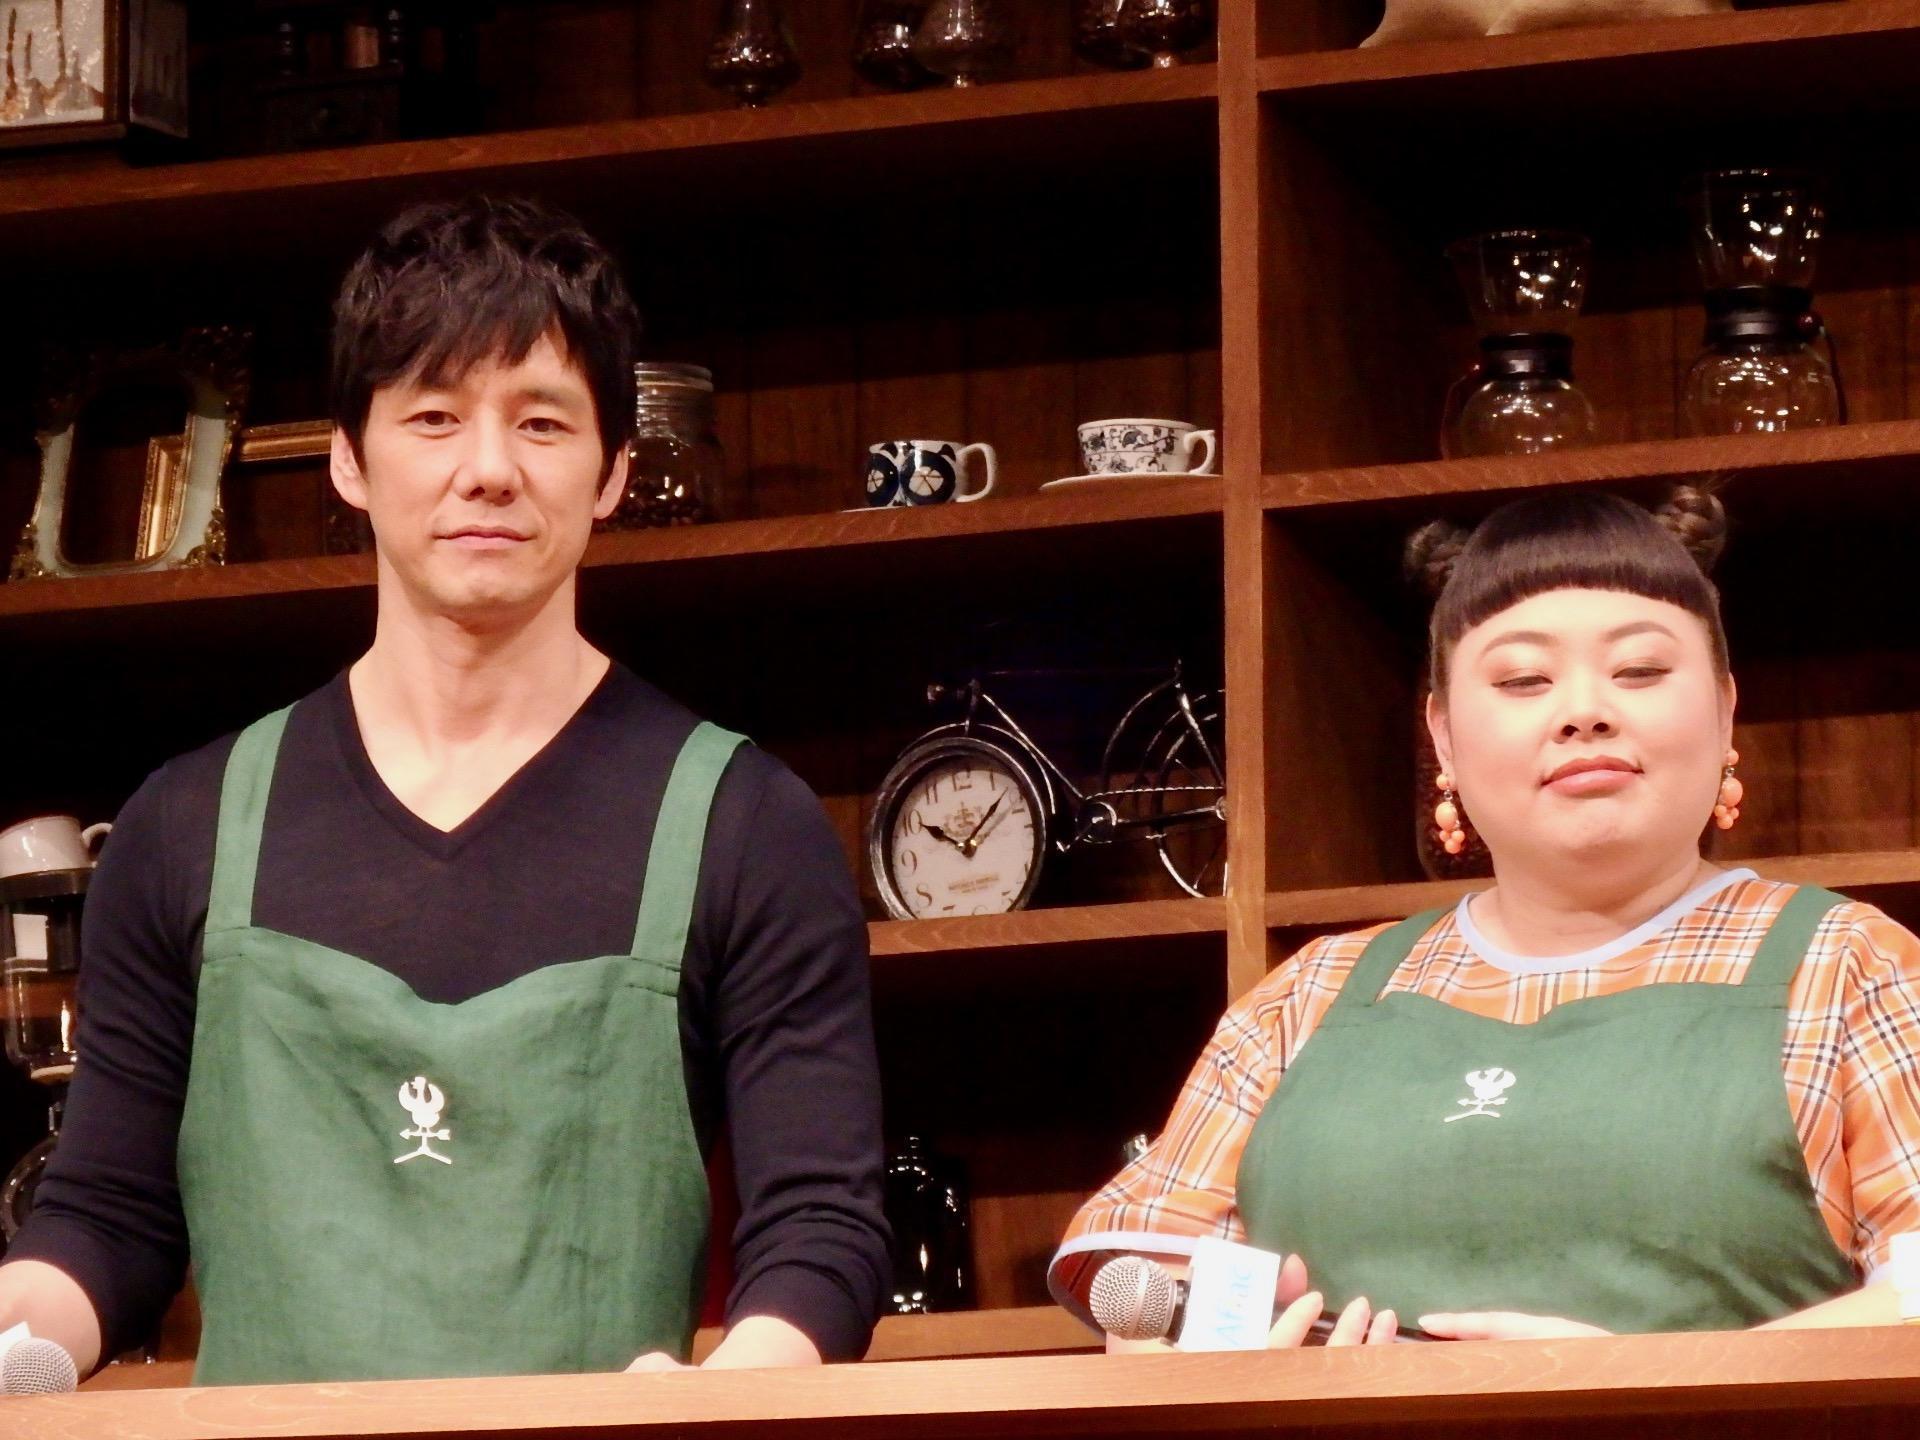 http://news.yoshimoto.co.jp/20190117190609-d4165f3cac87a66ea5cdd20dfafce1106059f8a4.jpeg